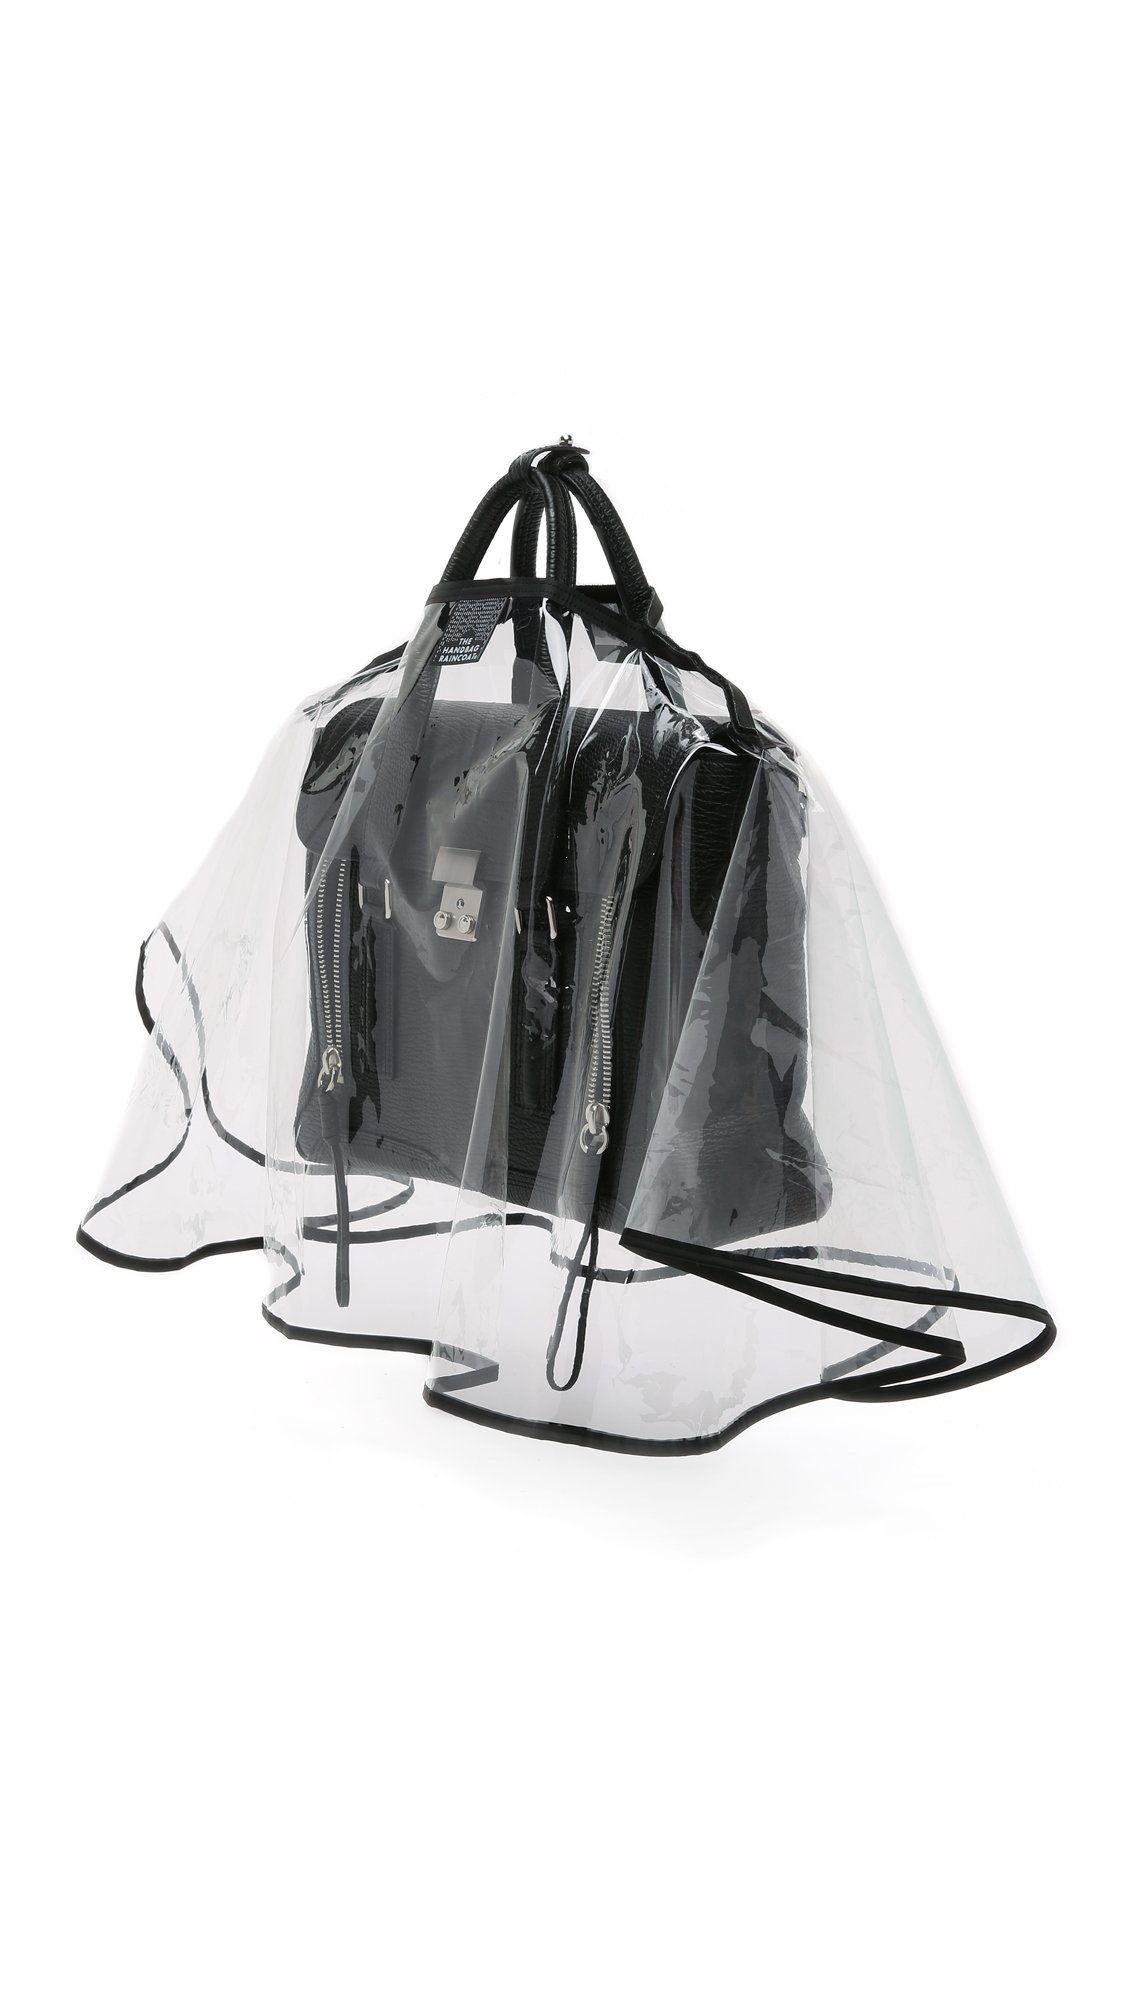 961ae2c6c9bd The Handbag Raincoat Women s Large City Slicker Handbag Raincoat ...